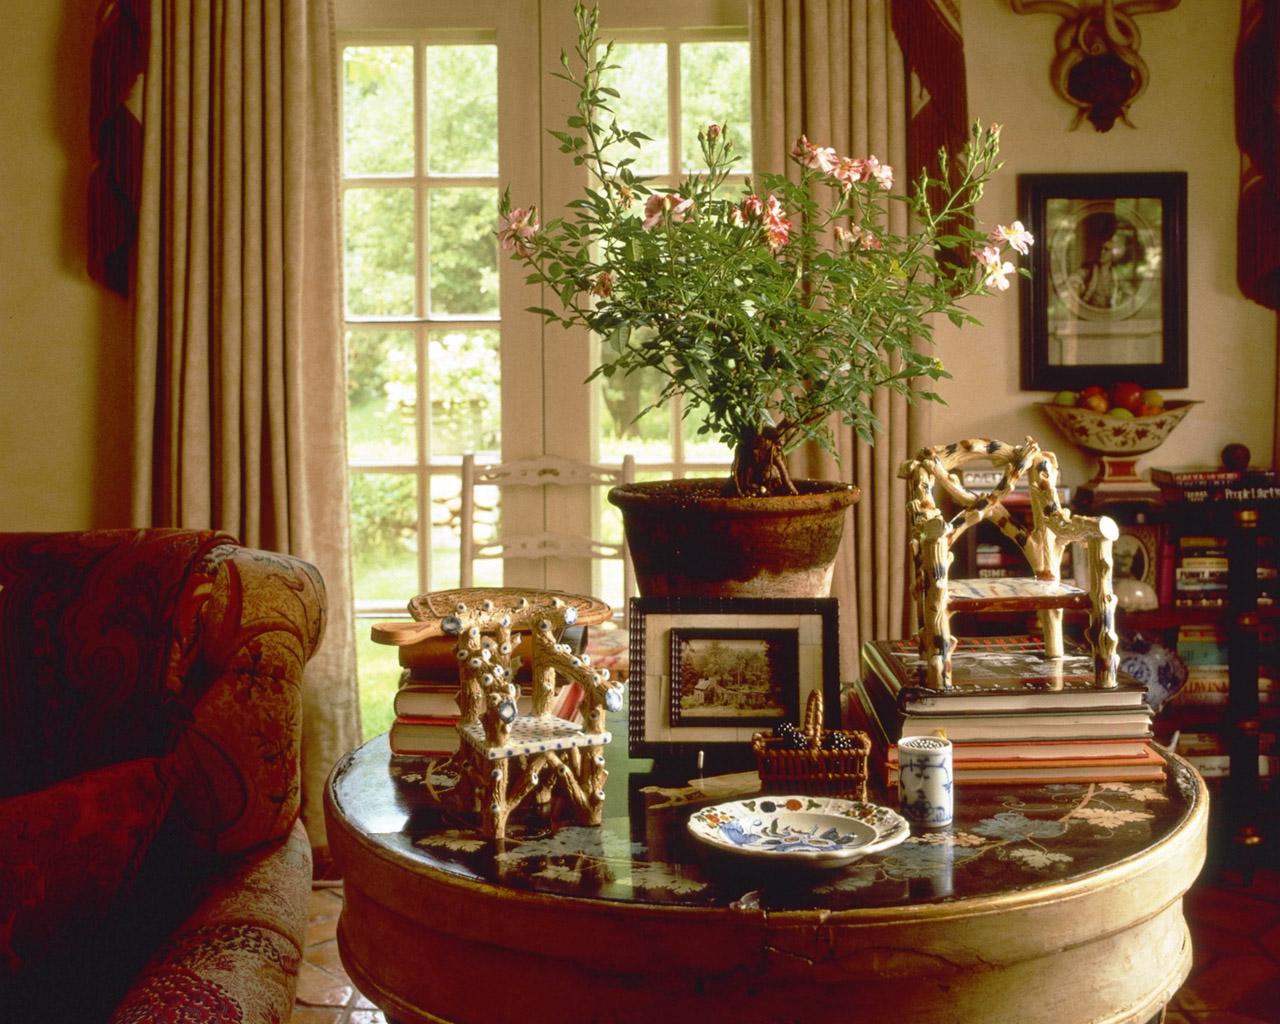 Living-Room-Plant-Decoration Living Room Plant Decoration